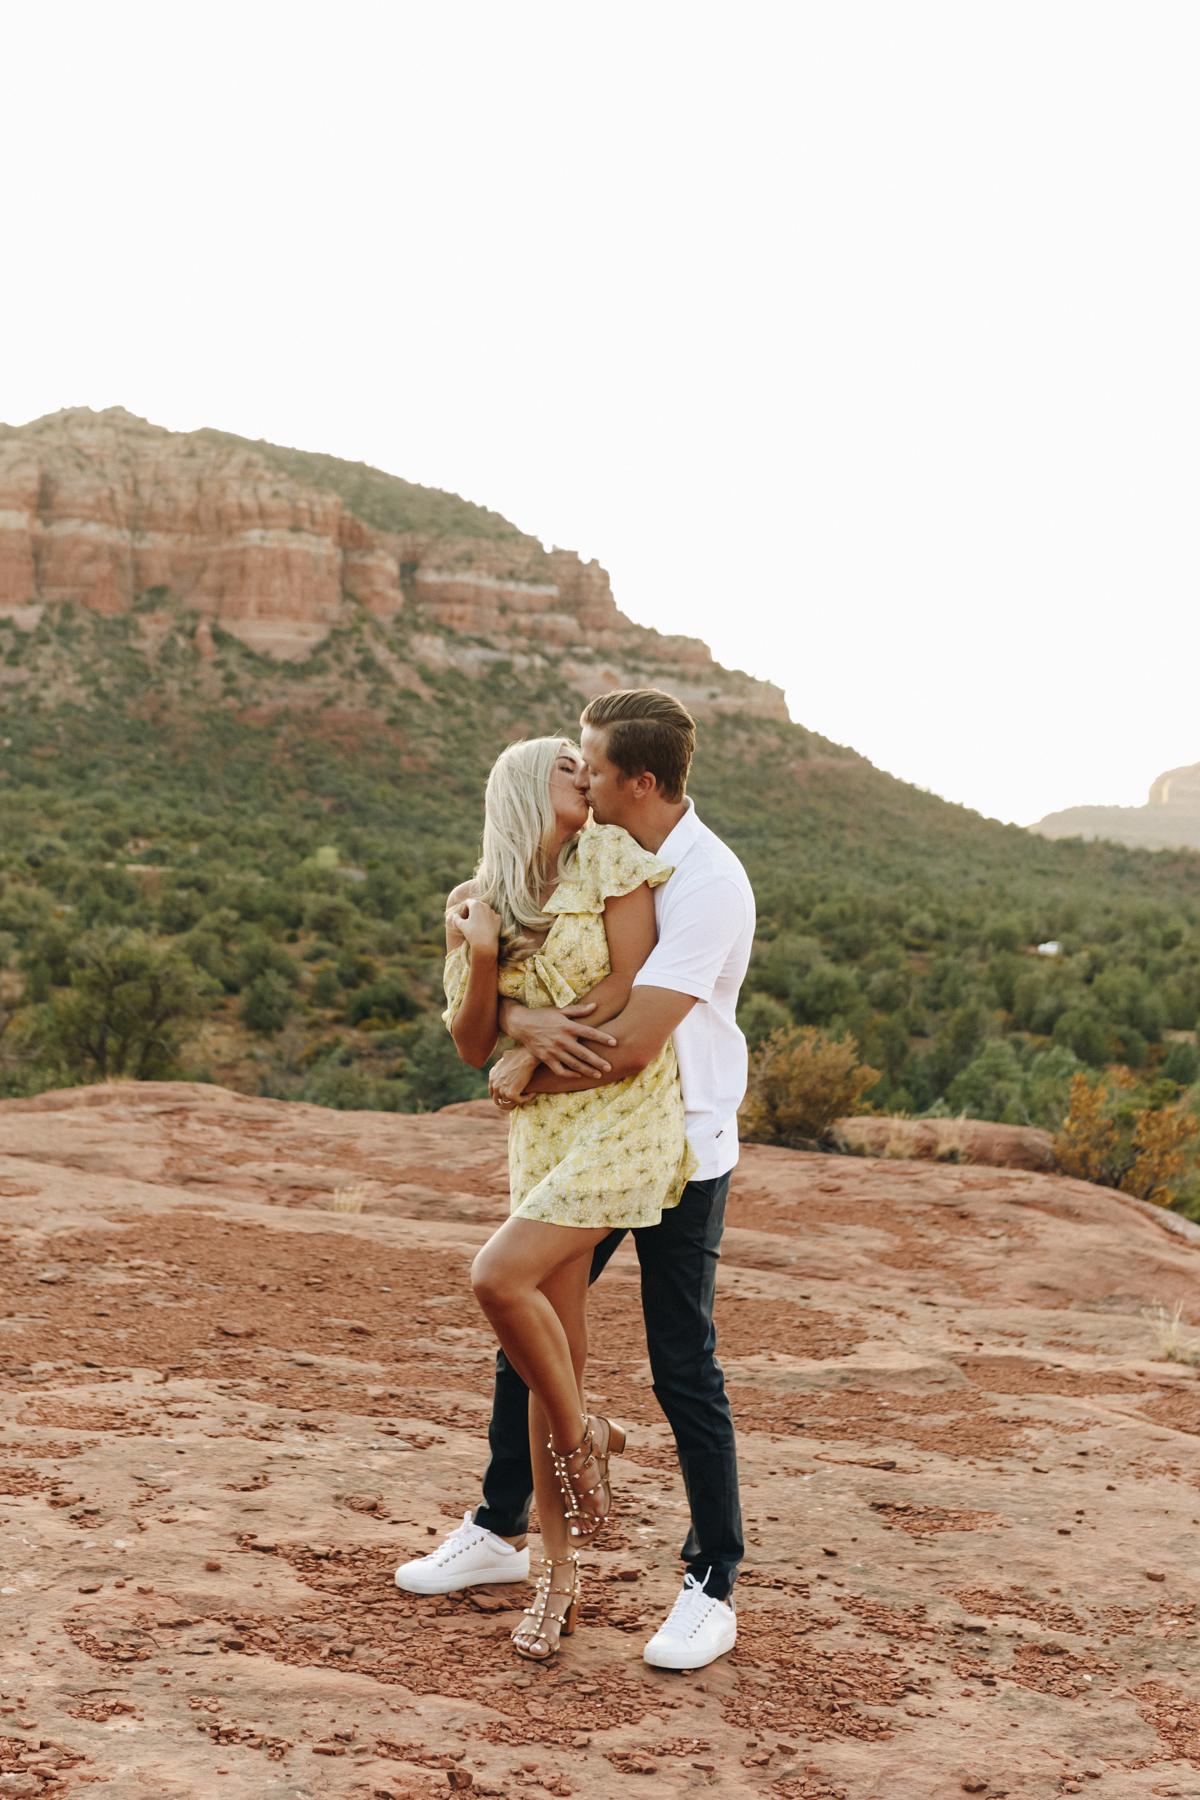 Megan Claire Photography | Adventurous Sedona Arizona Engagement Session